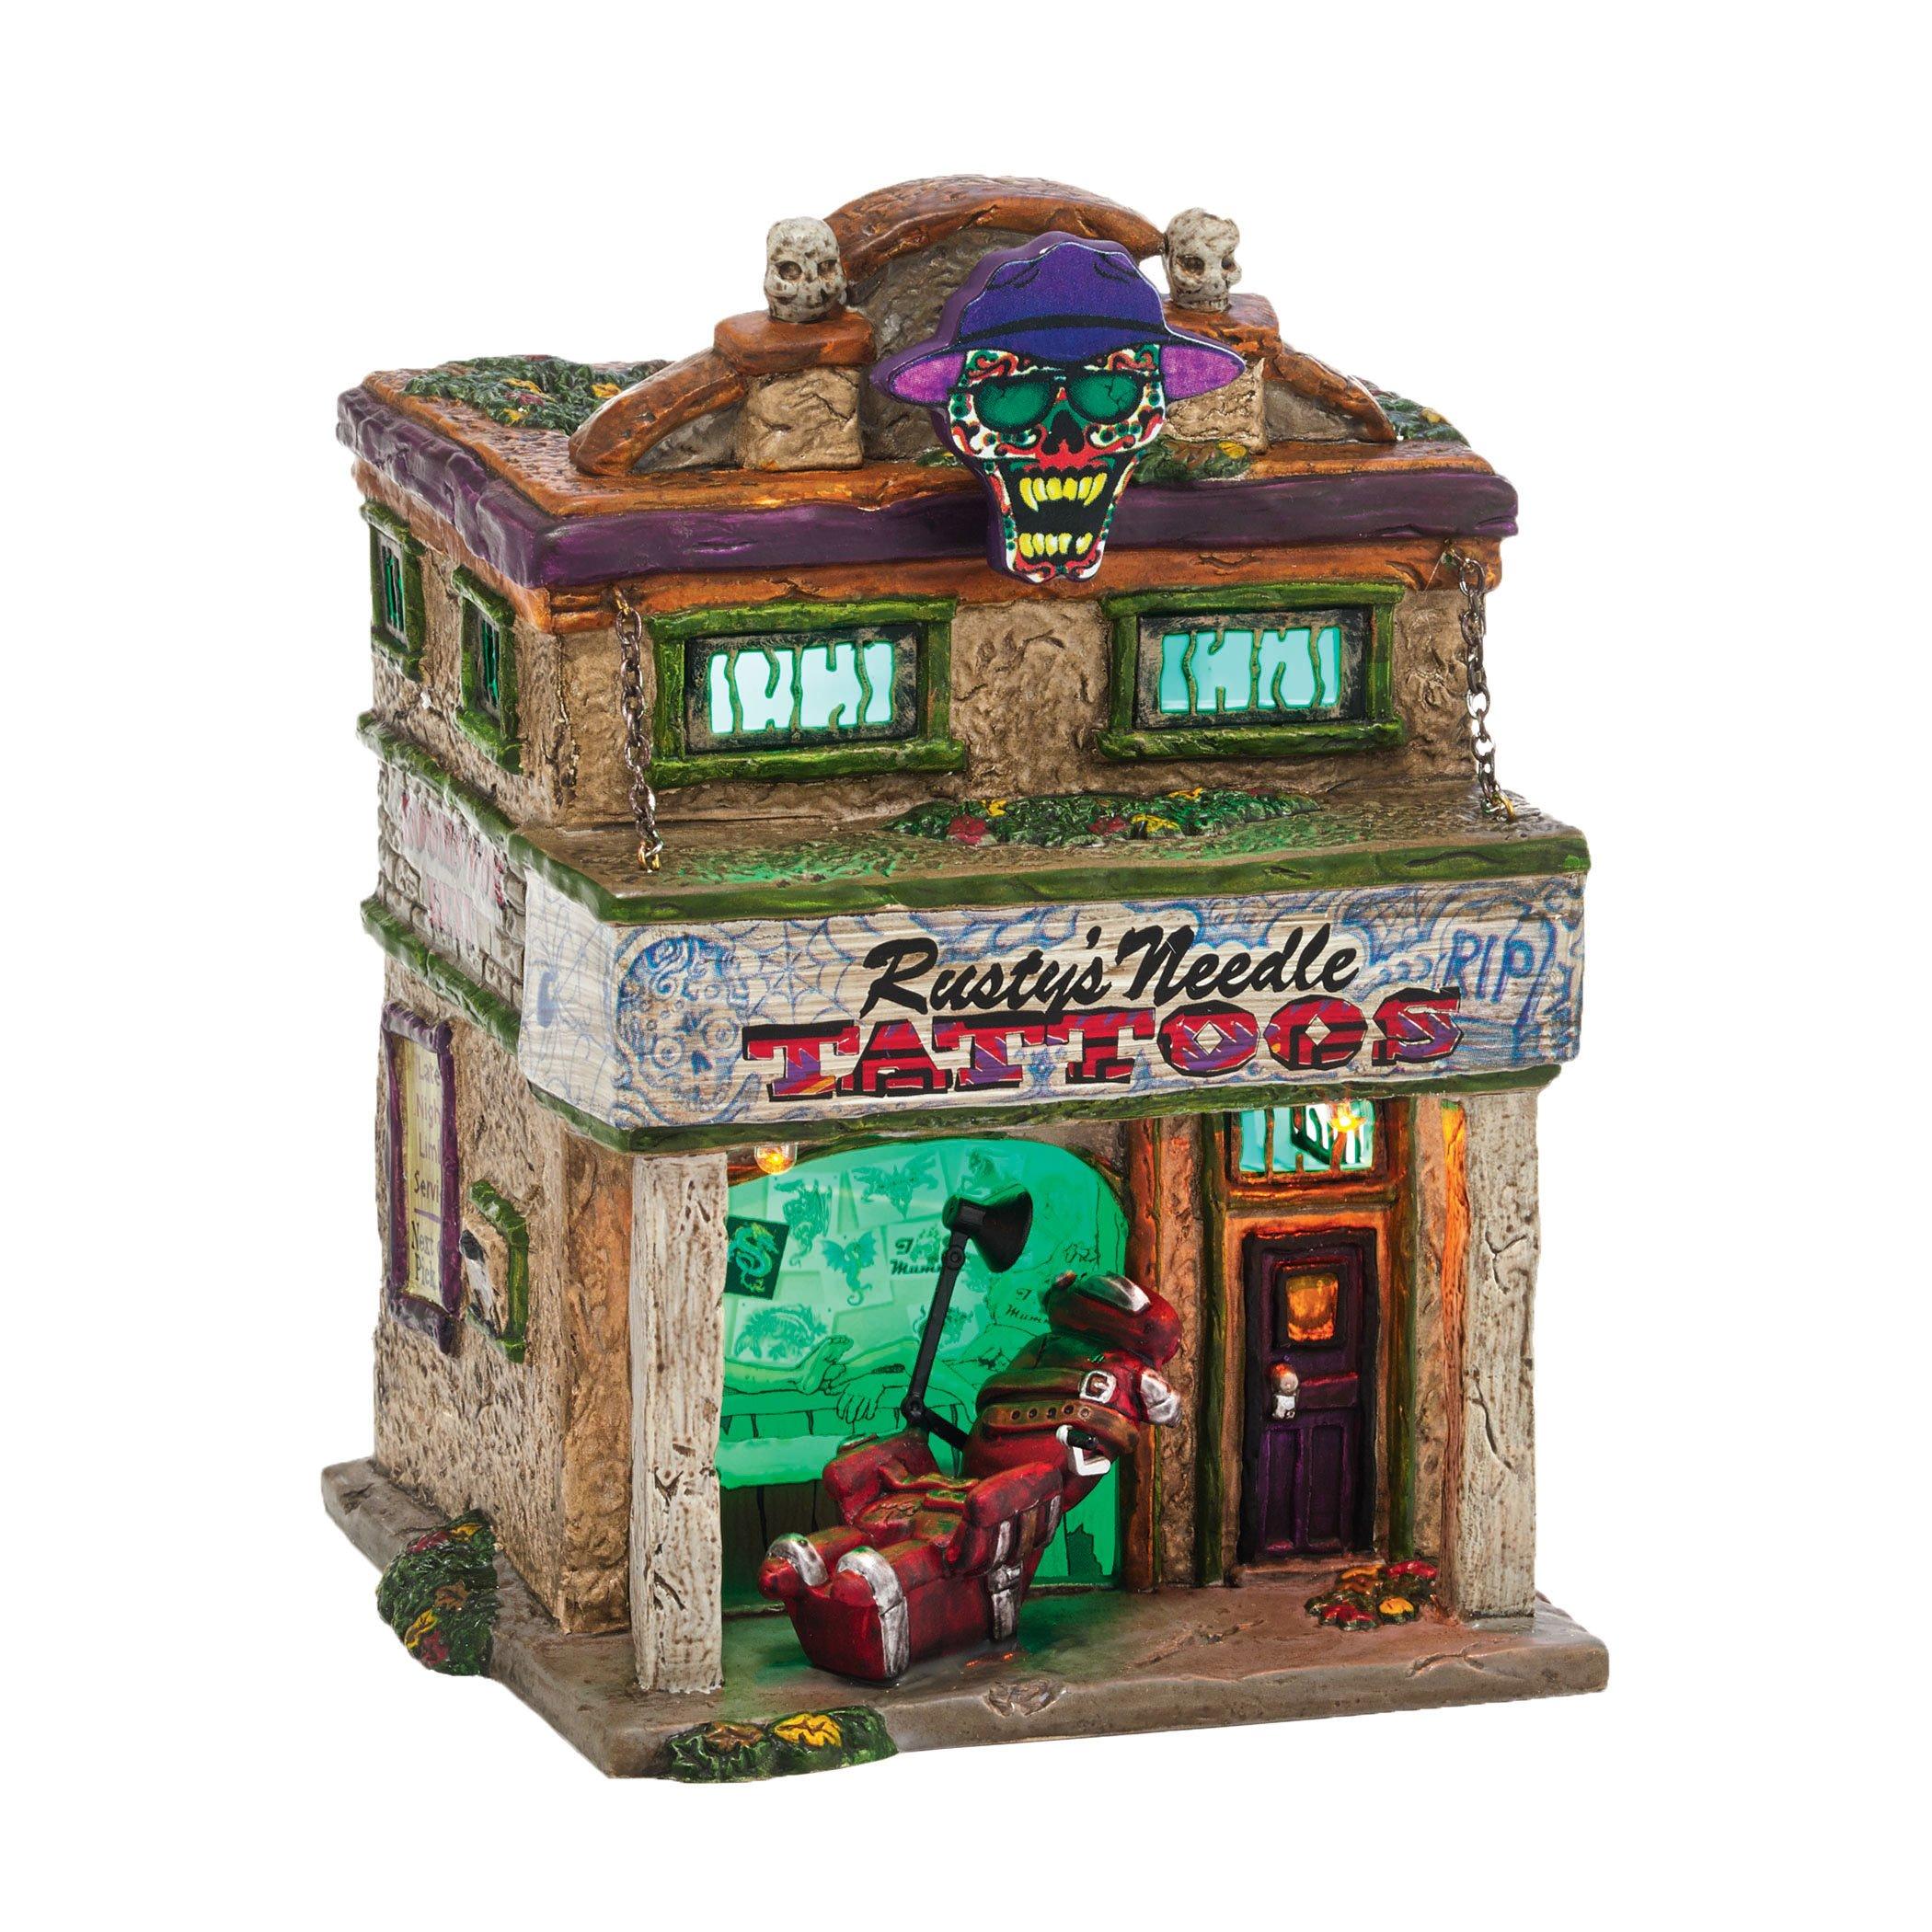 Department 56 Snow Village Halloween Rusty's Needle Lit House, 6.9 inch